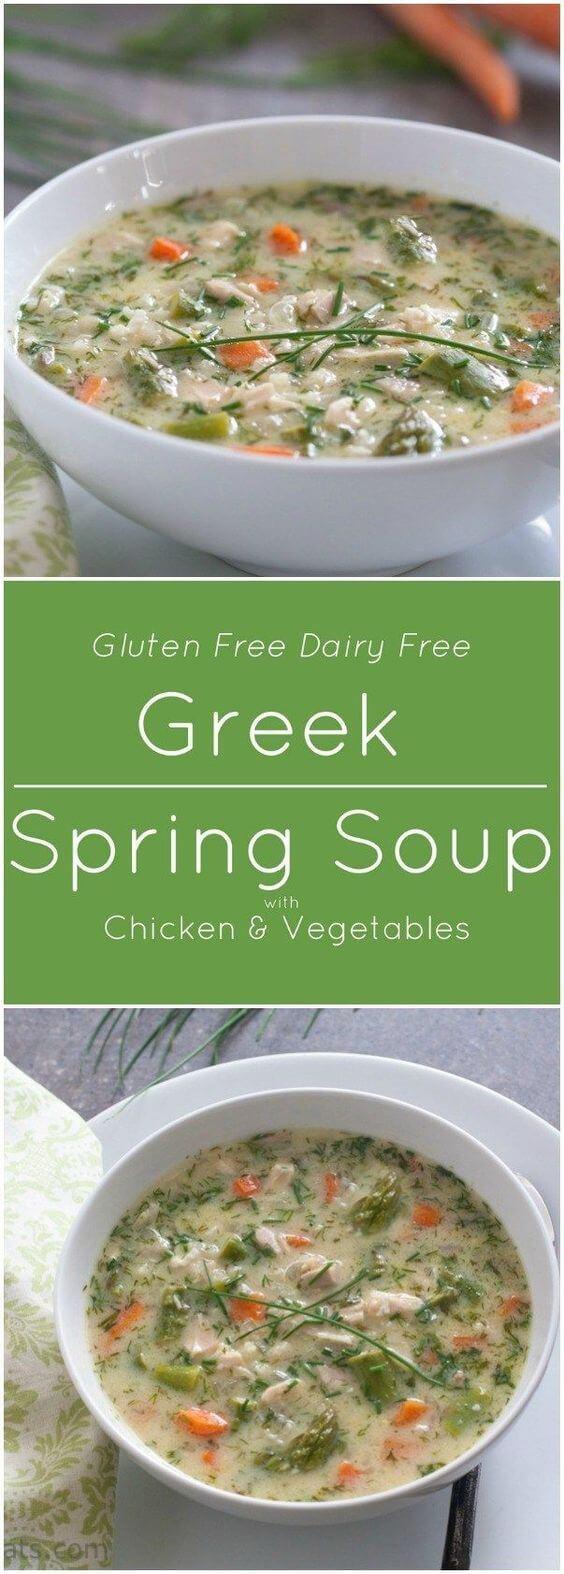 Greek Spring Soup